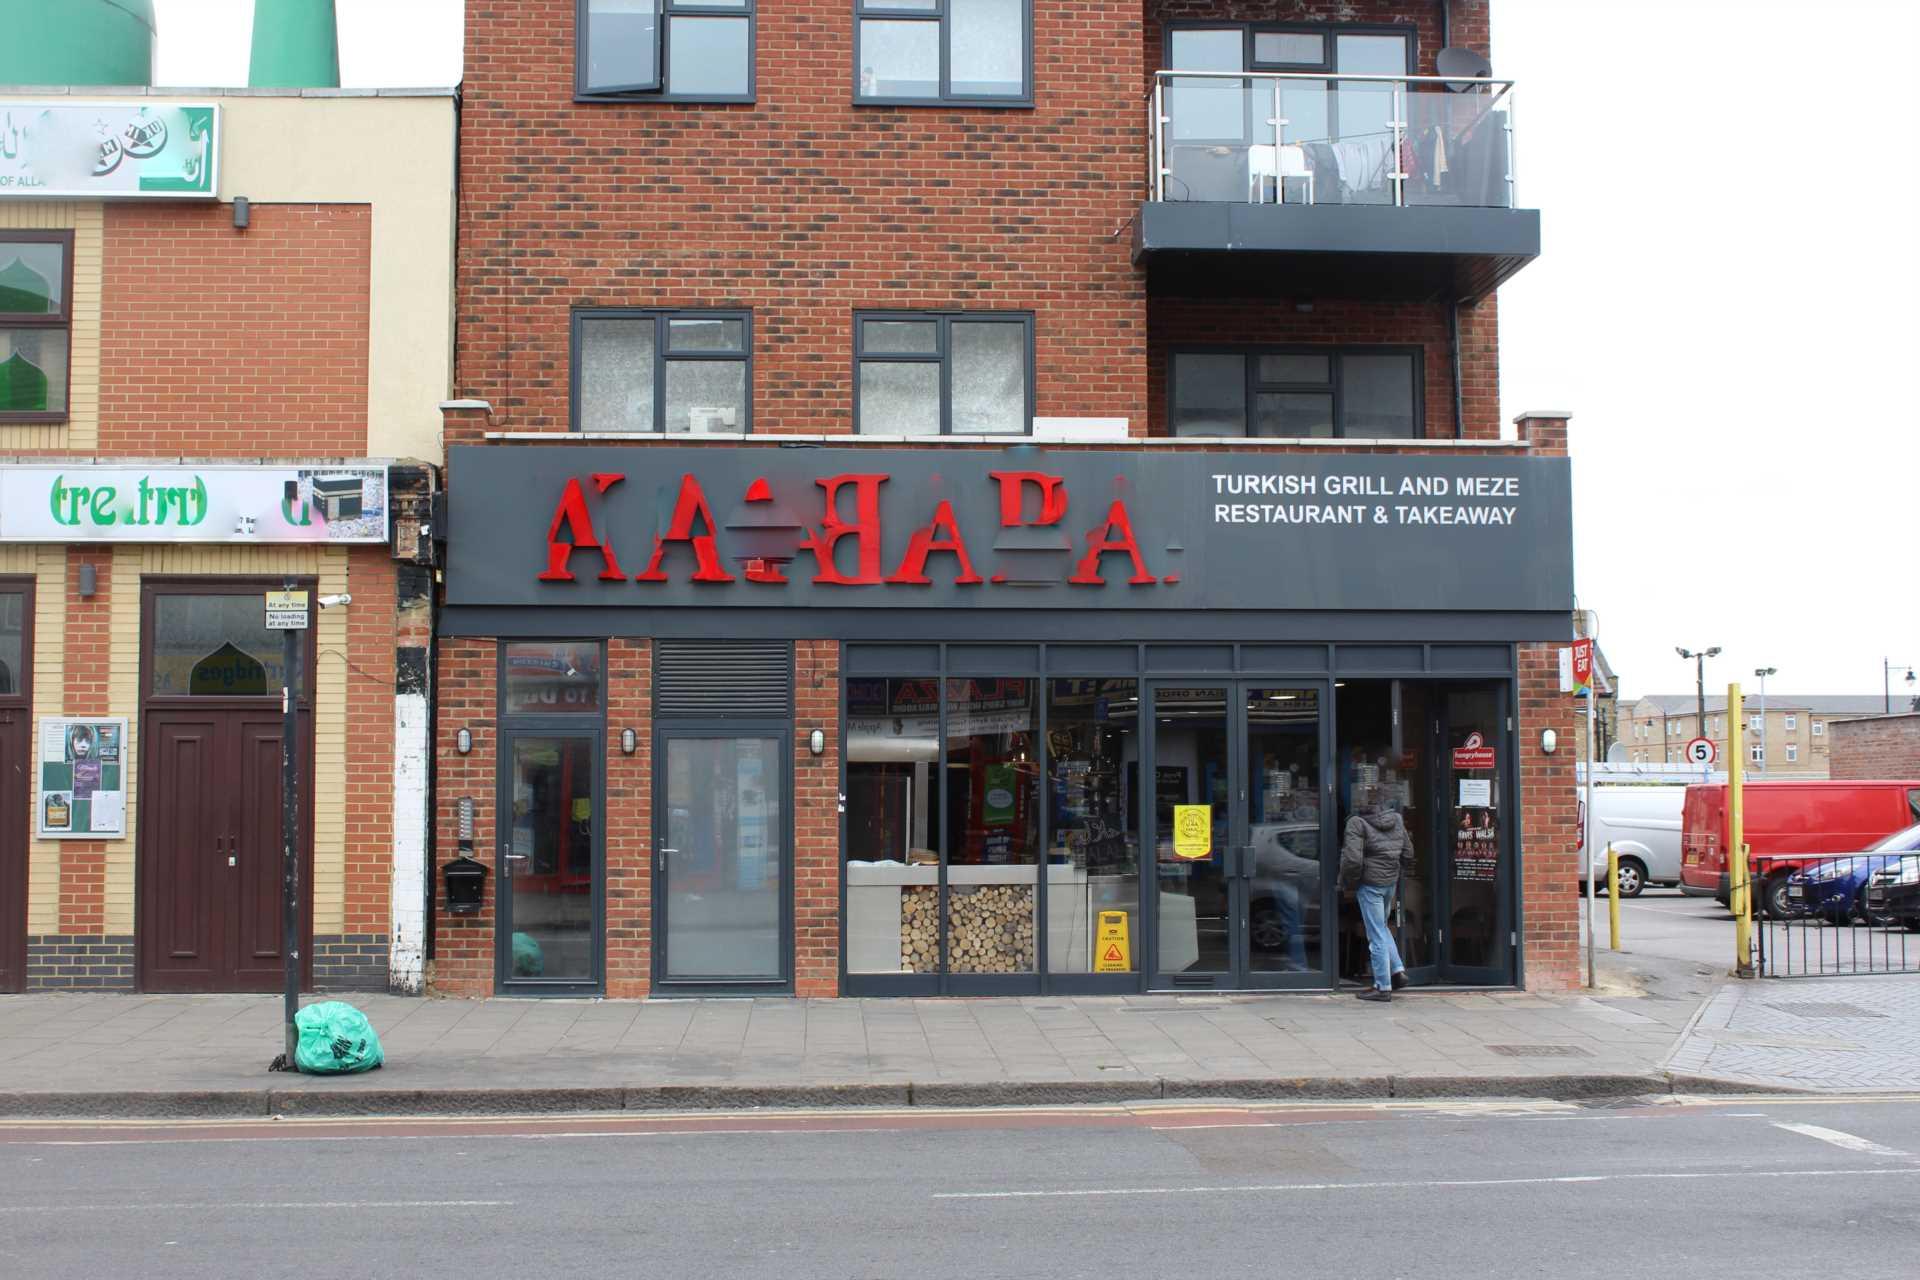 Kassaba Resturant London E6 1LB, London